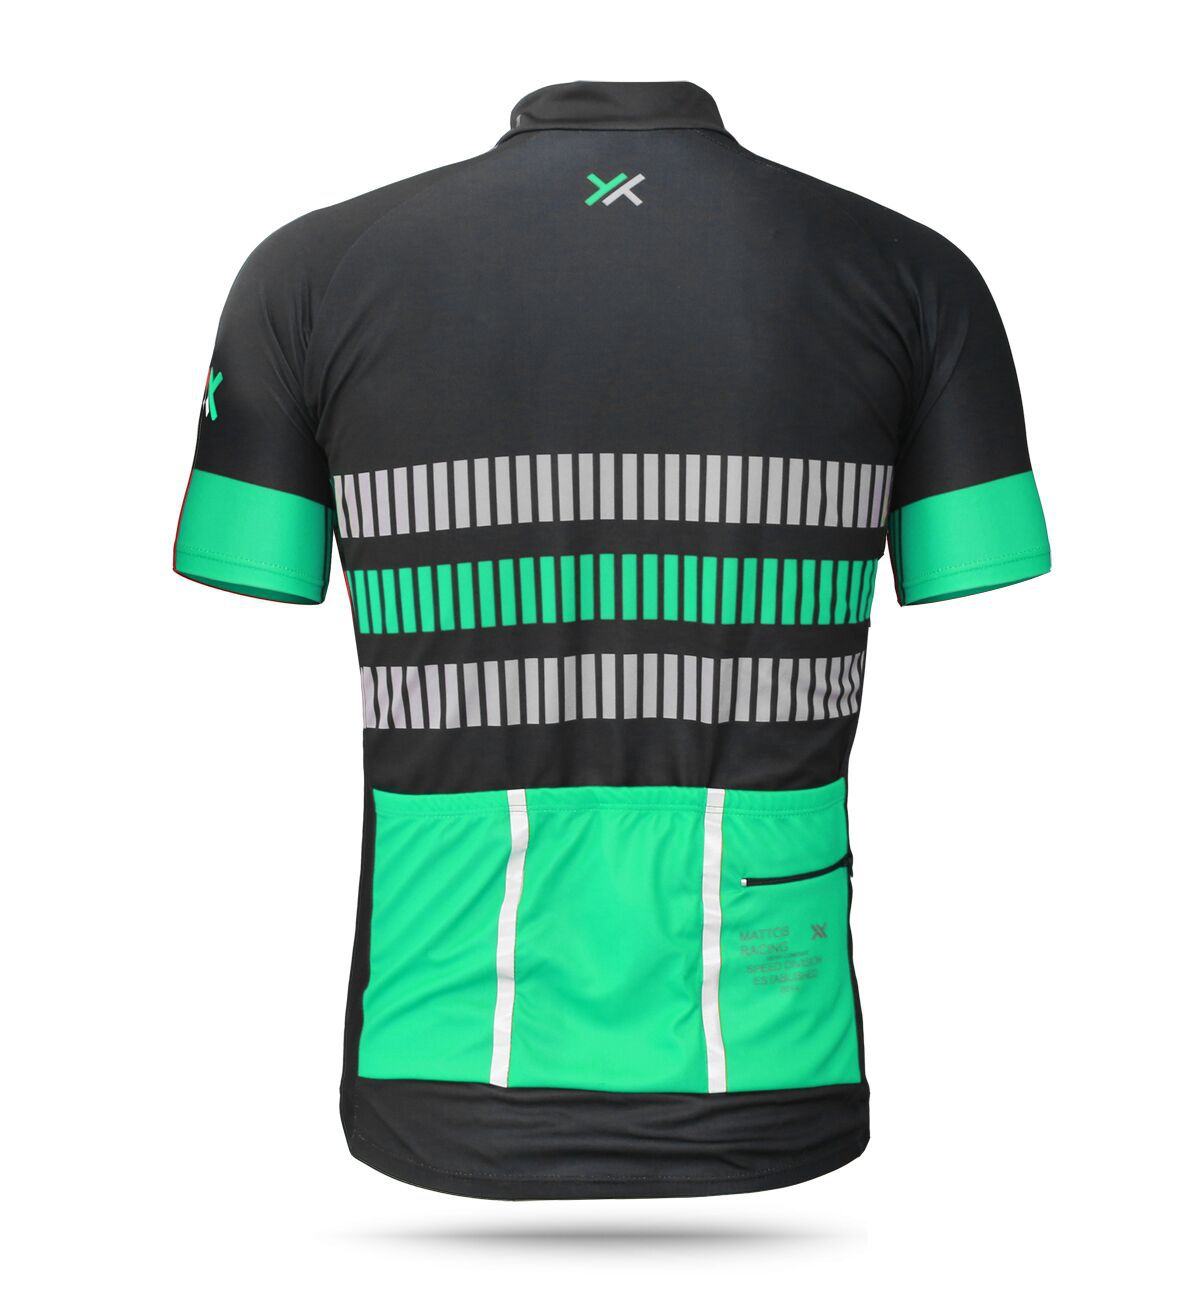 Camisa Feminina Mattos Racing Bike Track